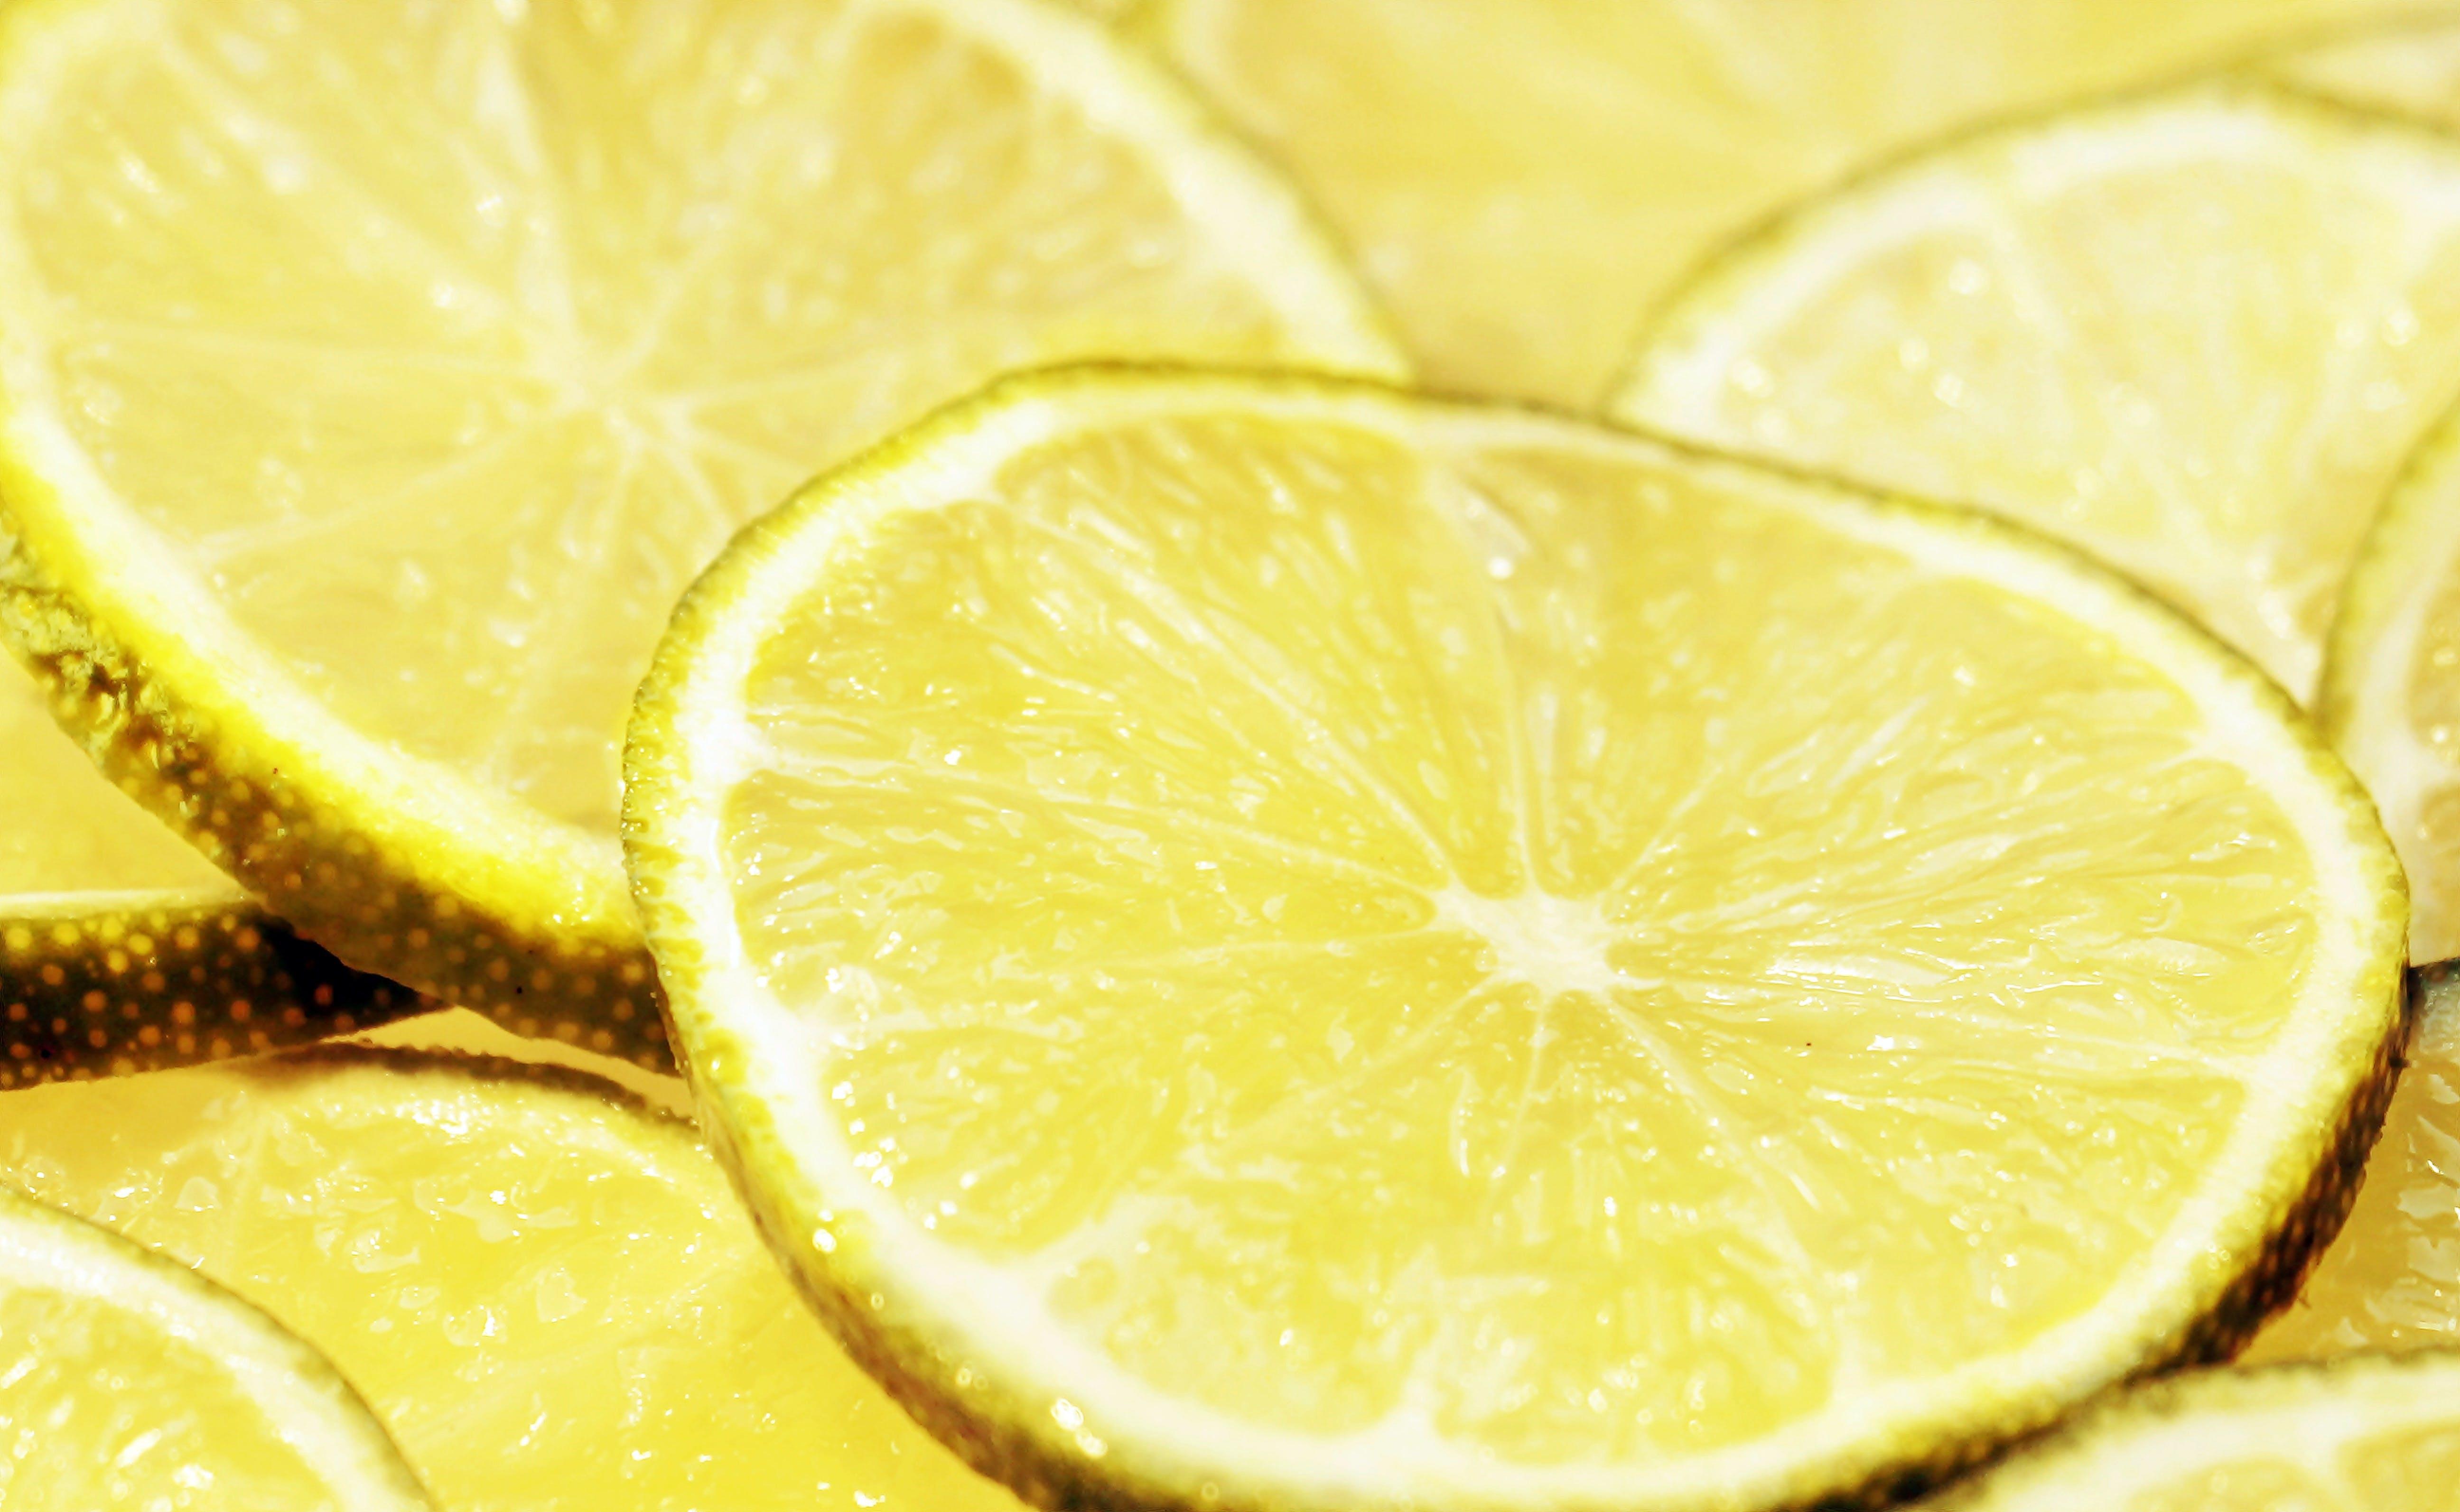 Slice of Citrus Fruits